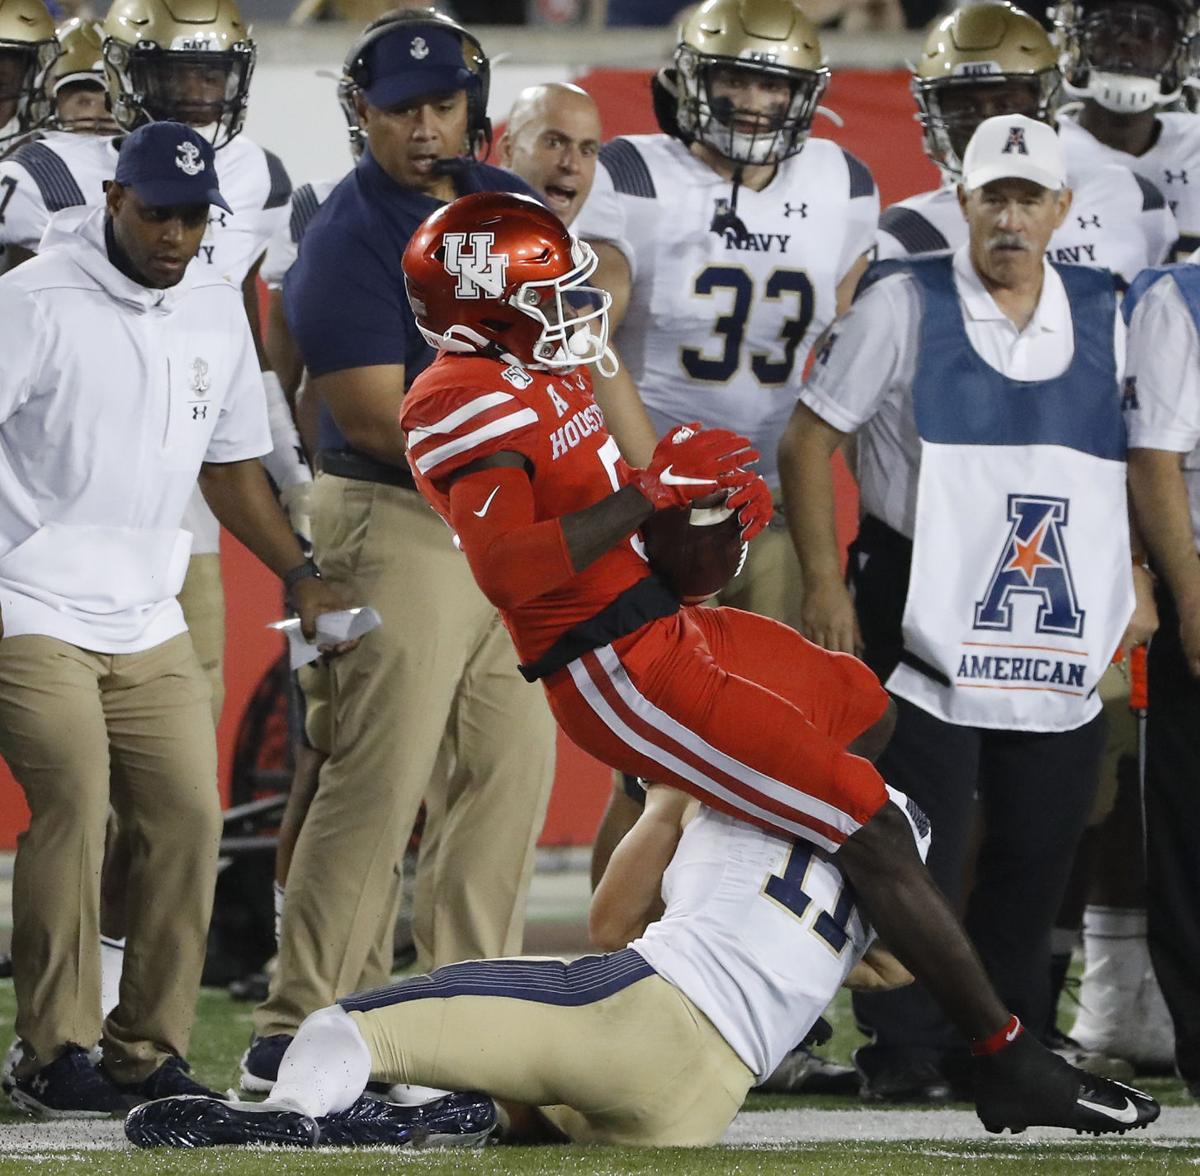 Houston Cougars vs. Navy Midshipmen